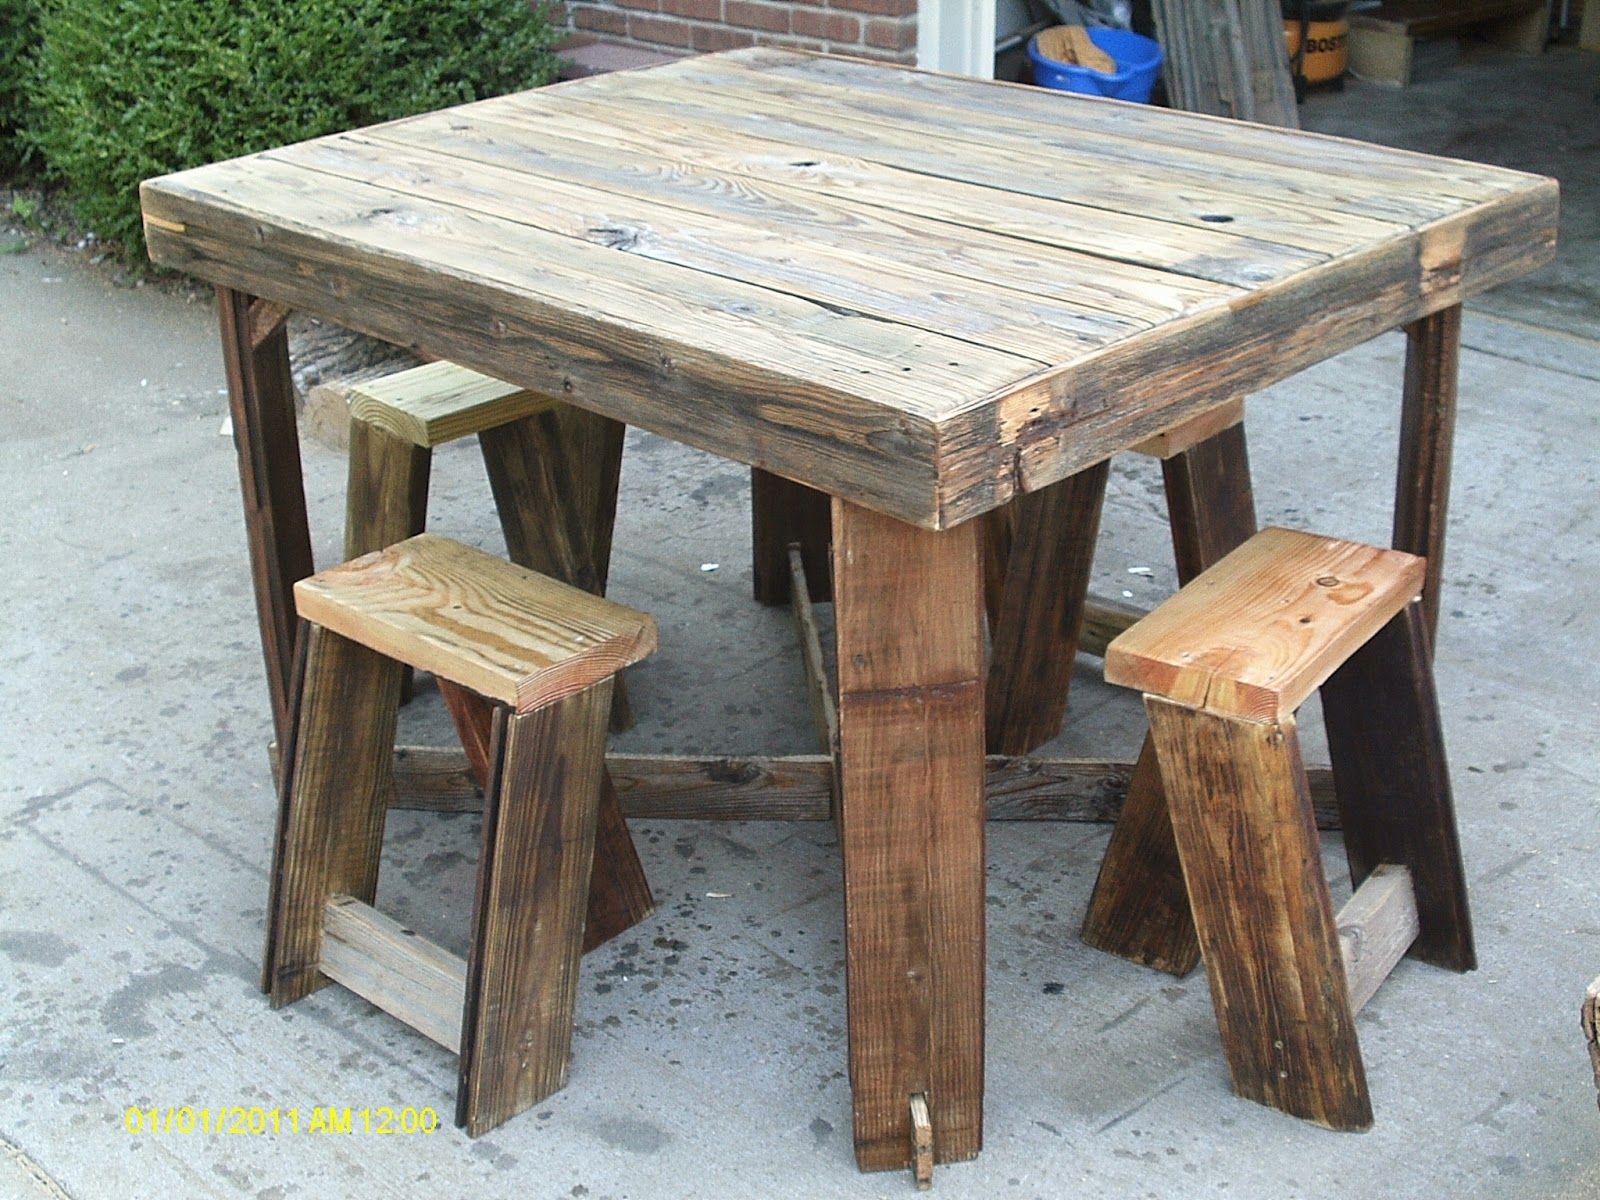 Handmade Rustic Log Furniture Pub Style Table And Stool Set